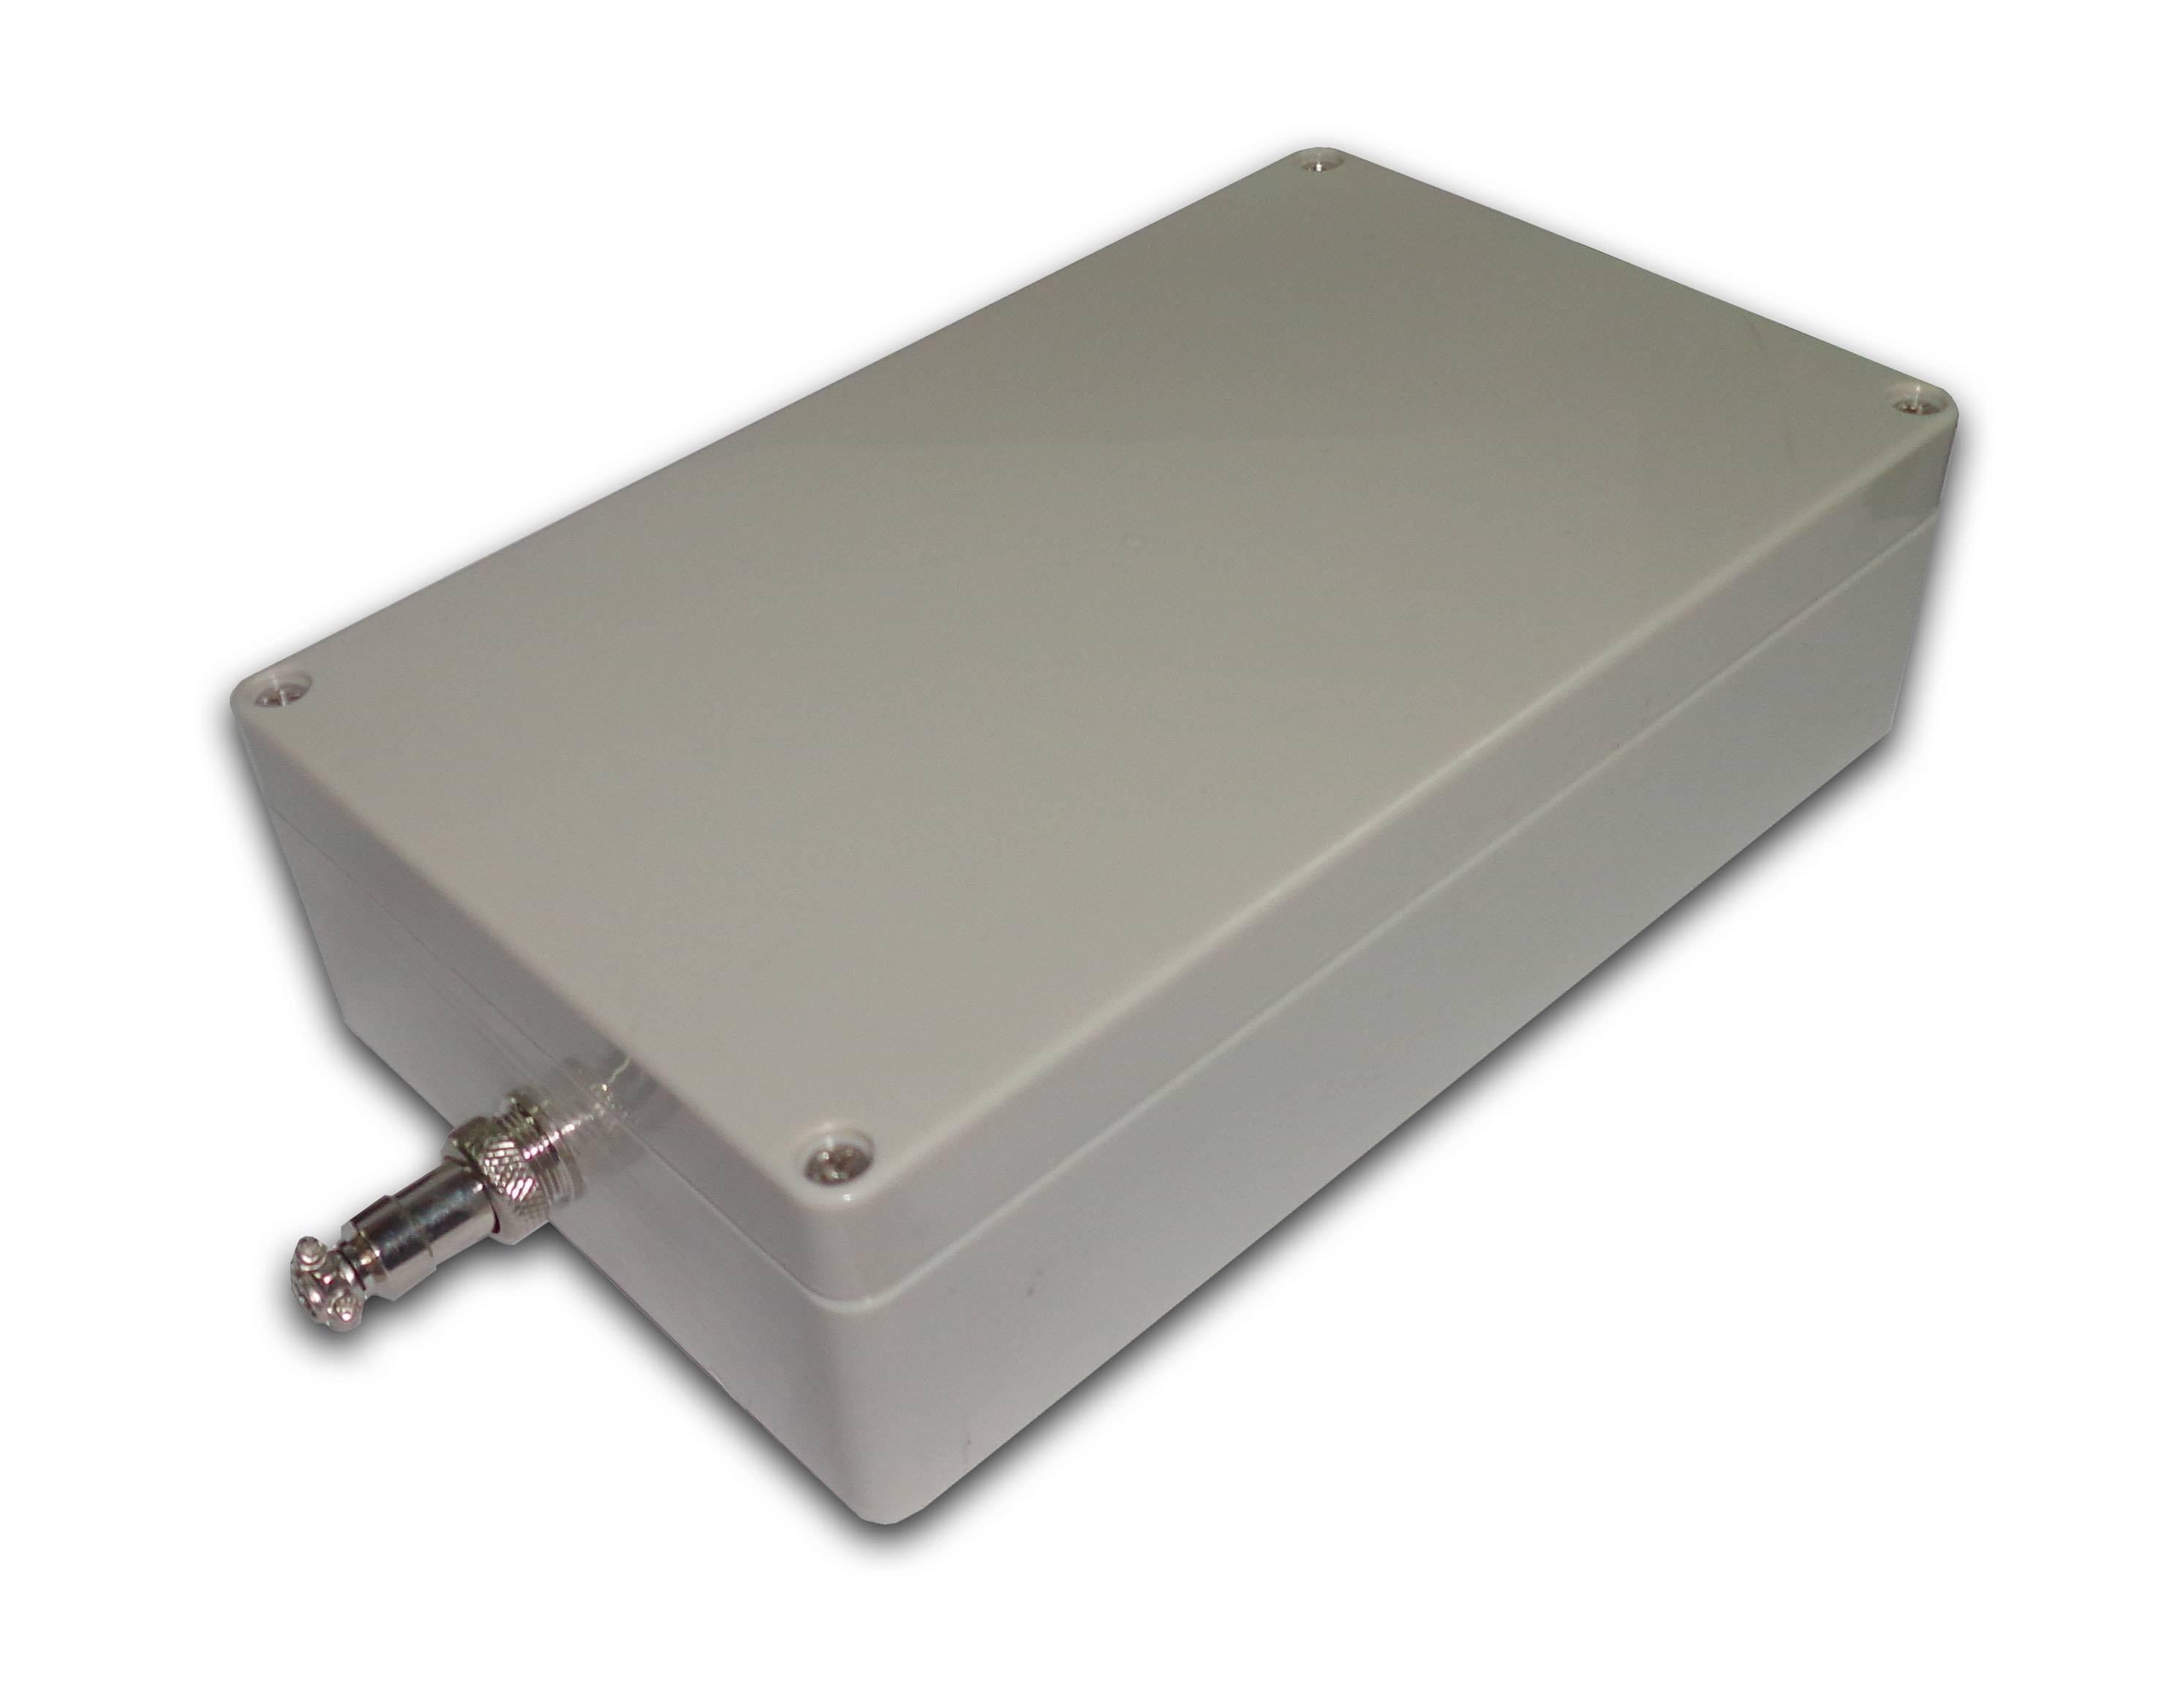 Vehicle GPS tracker HE2000 with 30000mAh battery